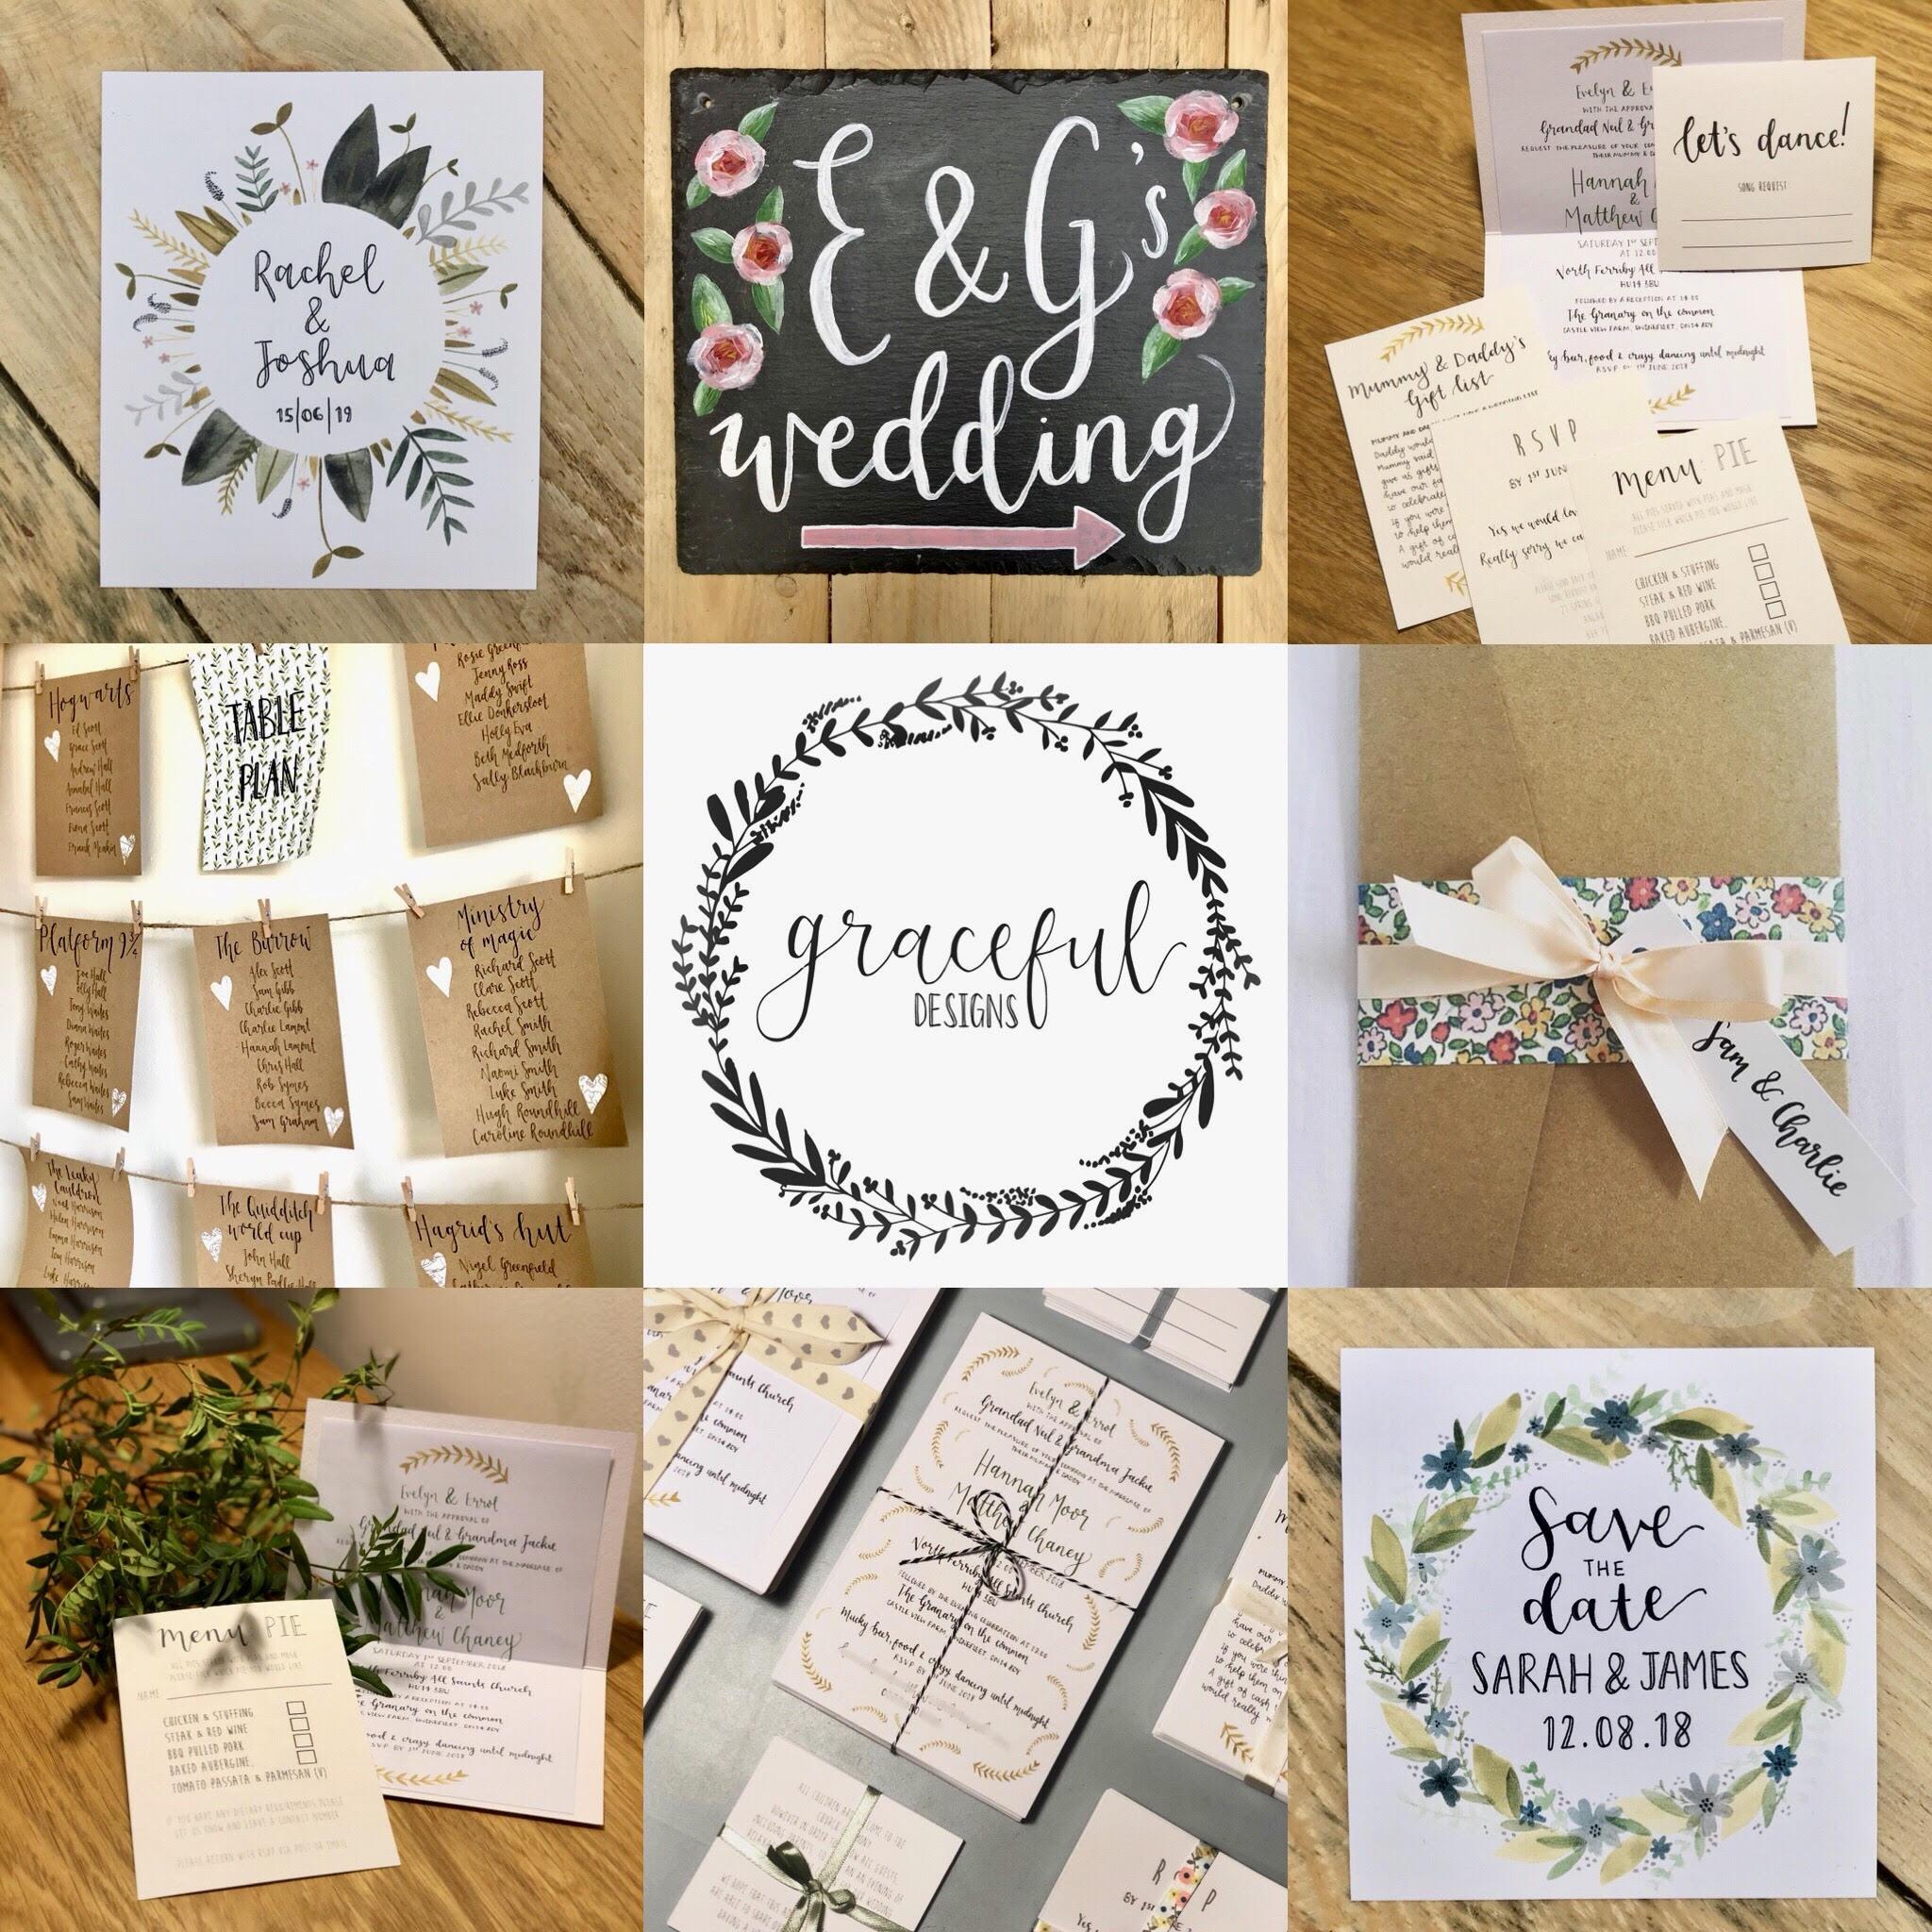 "https://abrahamphotography.co.uk/wp-content/uploads/2018/05/Wedding-Collage--500x500.jpg"""